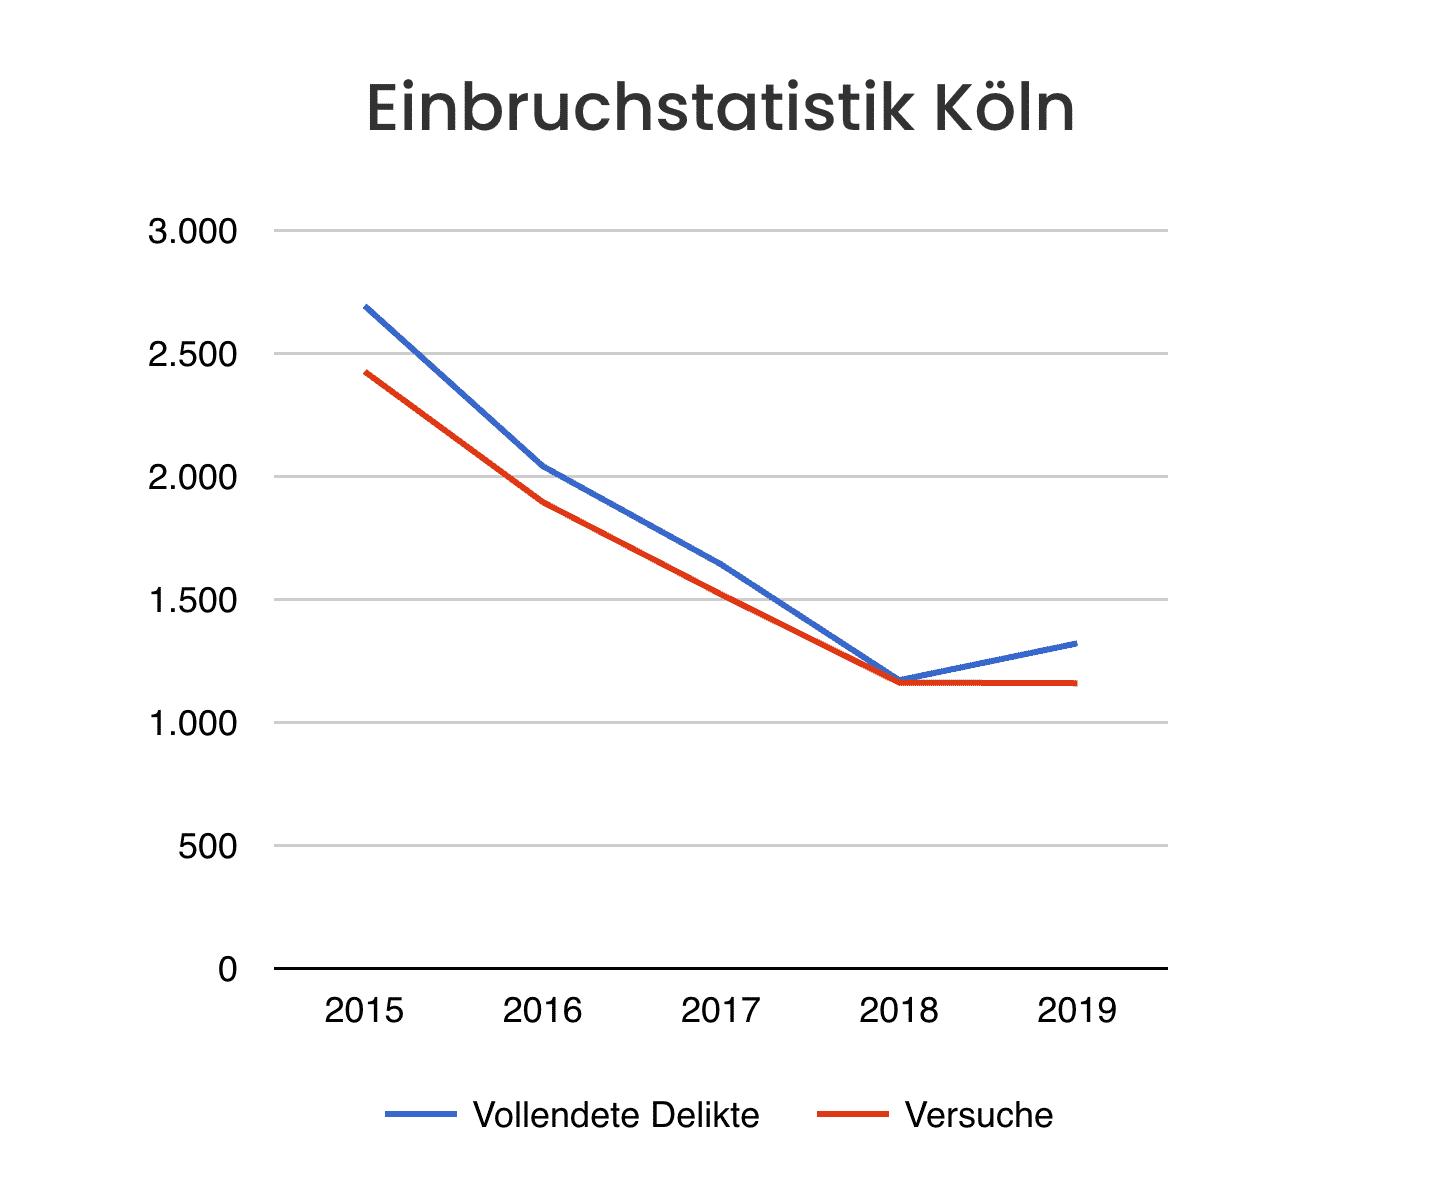 Einbruchsatistik Köln